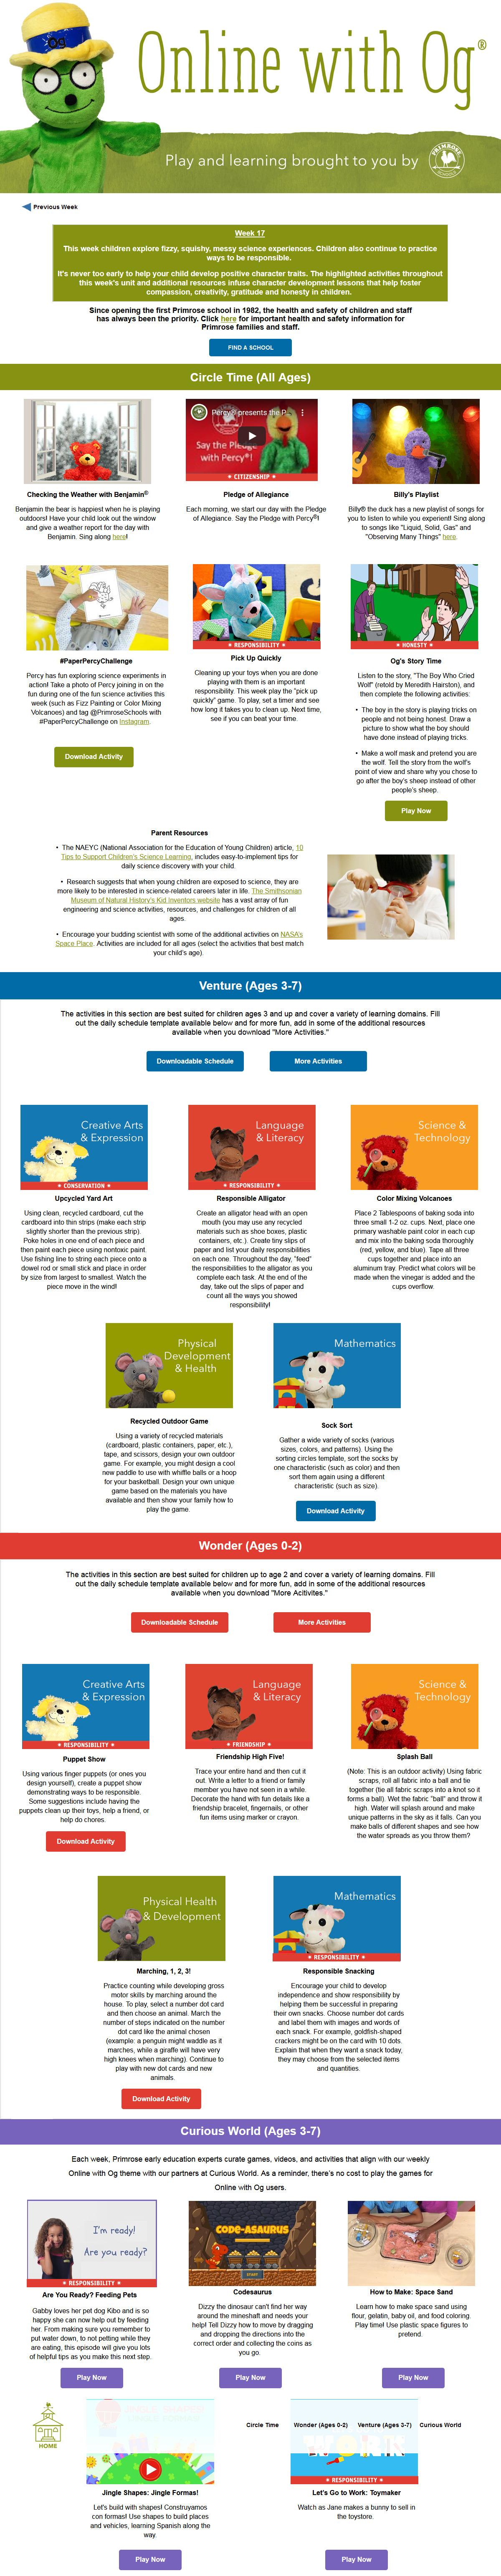 Online with Og *Free Online Preschool Curriculum* Week 17 - Squishy, Fizzy Fun!